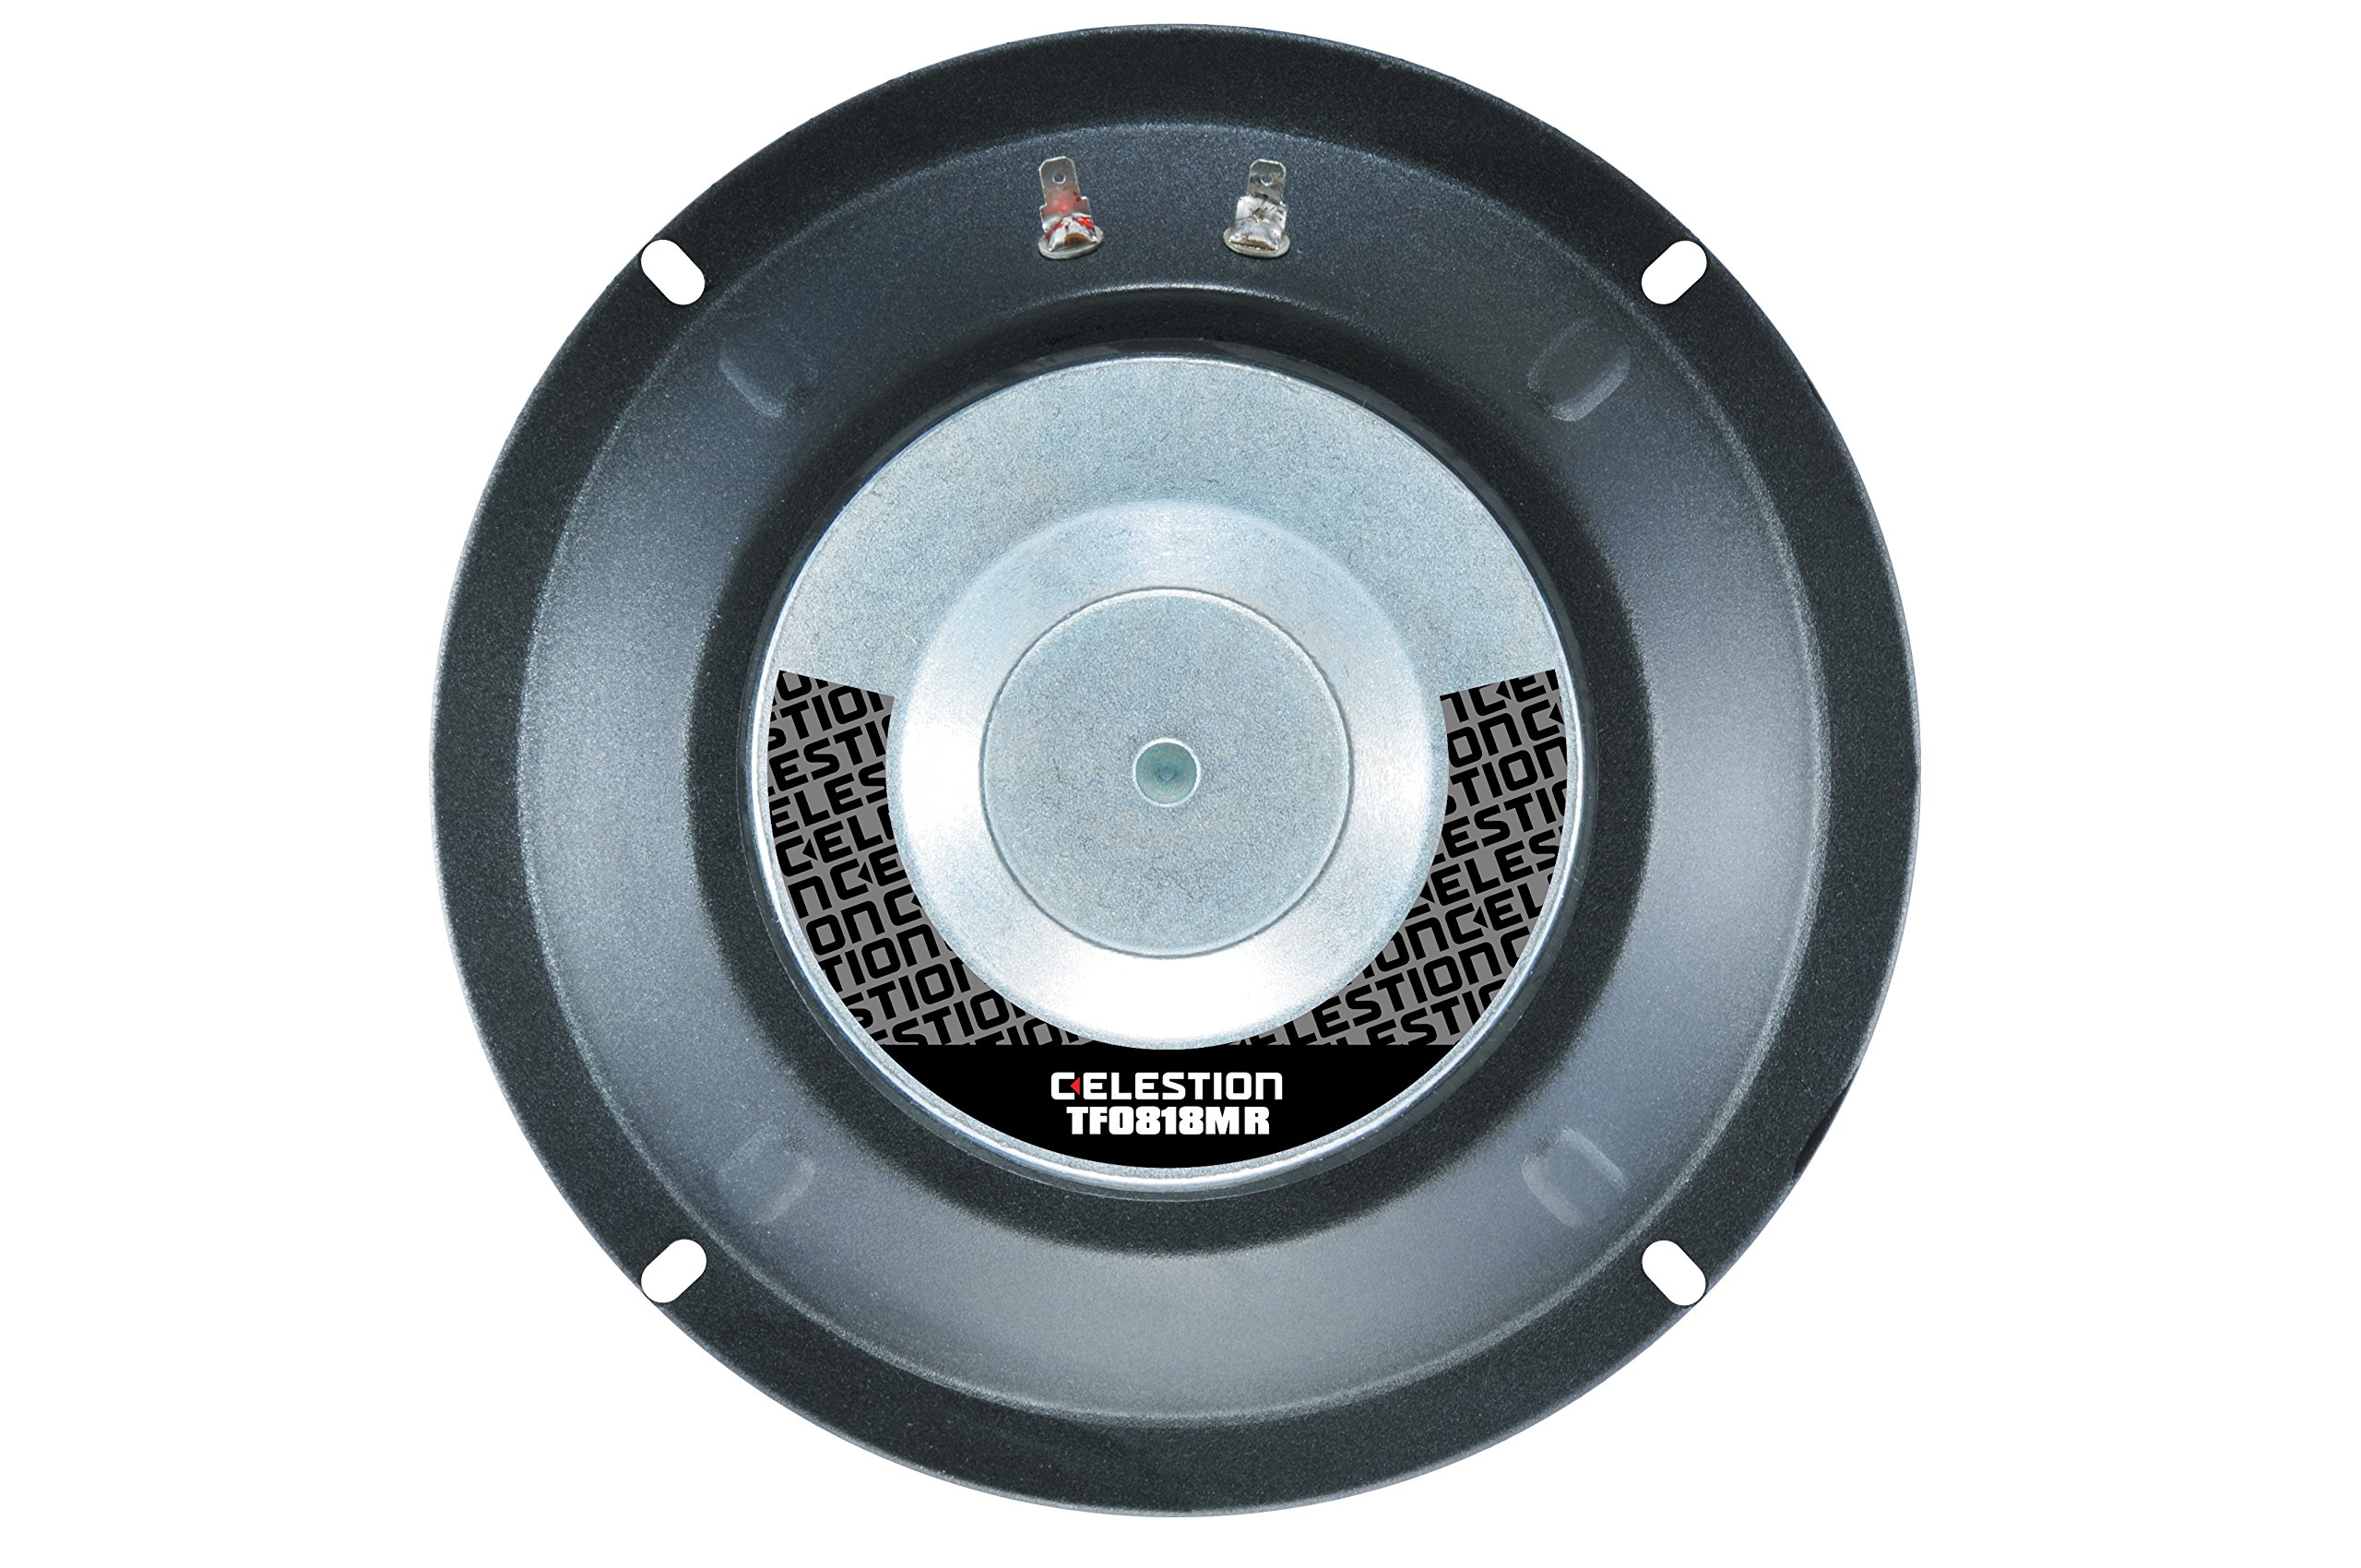 Celestion TF 0818MR 100 Watt Raw Frame Speaker, 8 Ohm, 8 inch